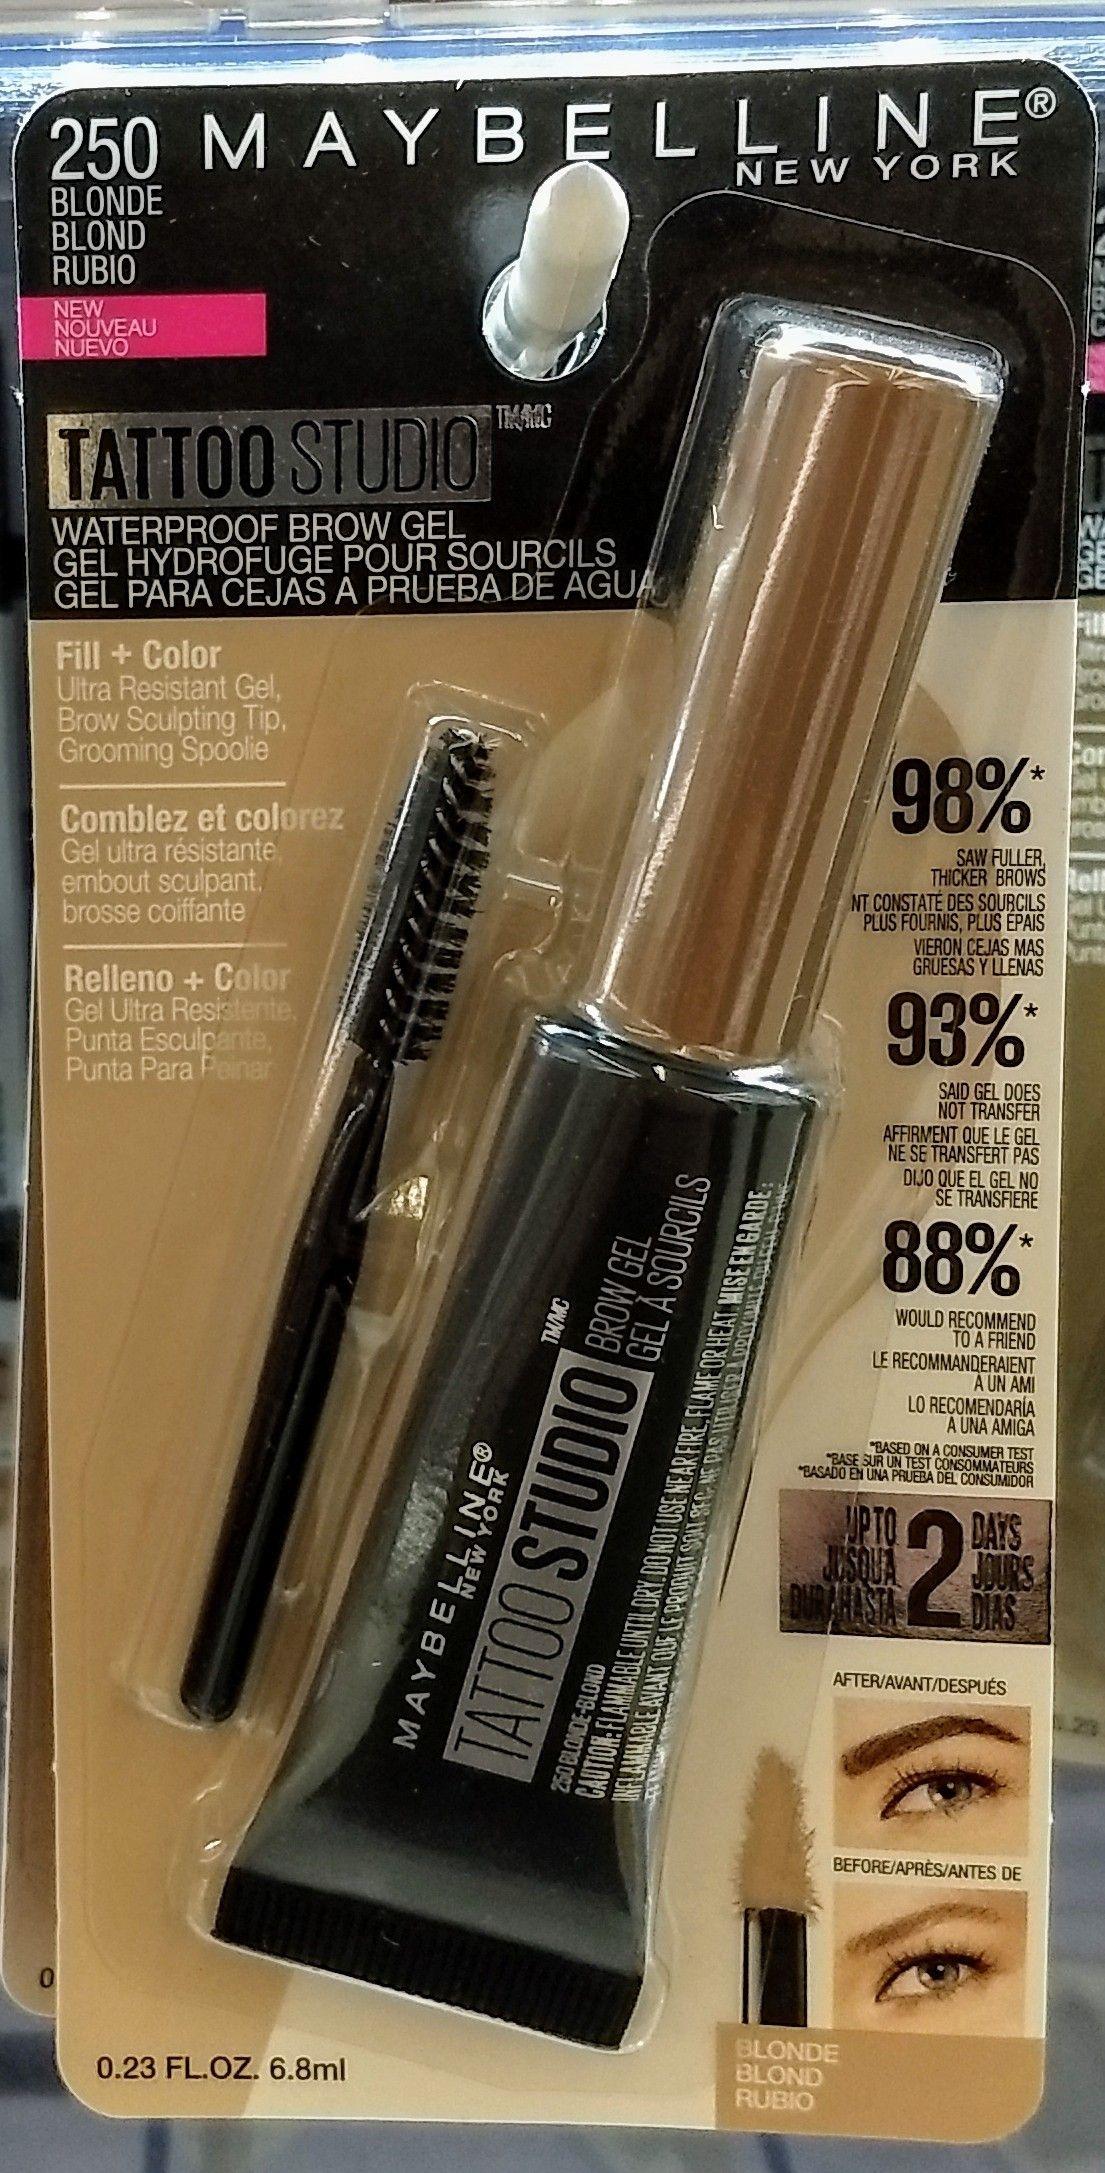 Tattoo Makeup Walmart : tattoo, makeup, walmart, Maybelline, Tattoo, Studio, Waterproof, Blonde, .46, Walmart, Brows,